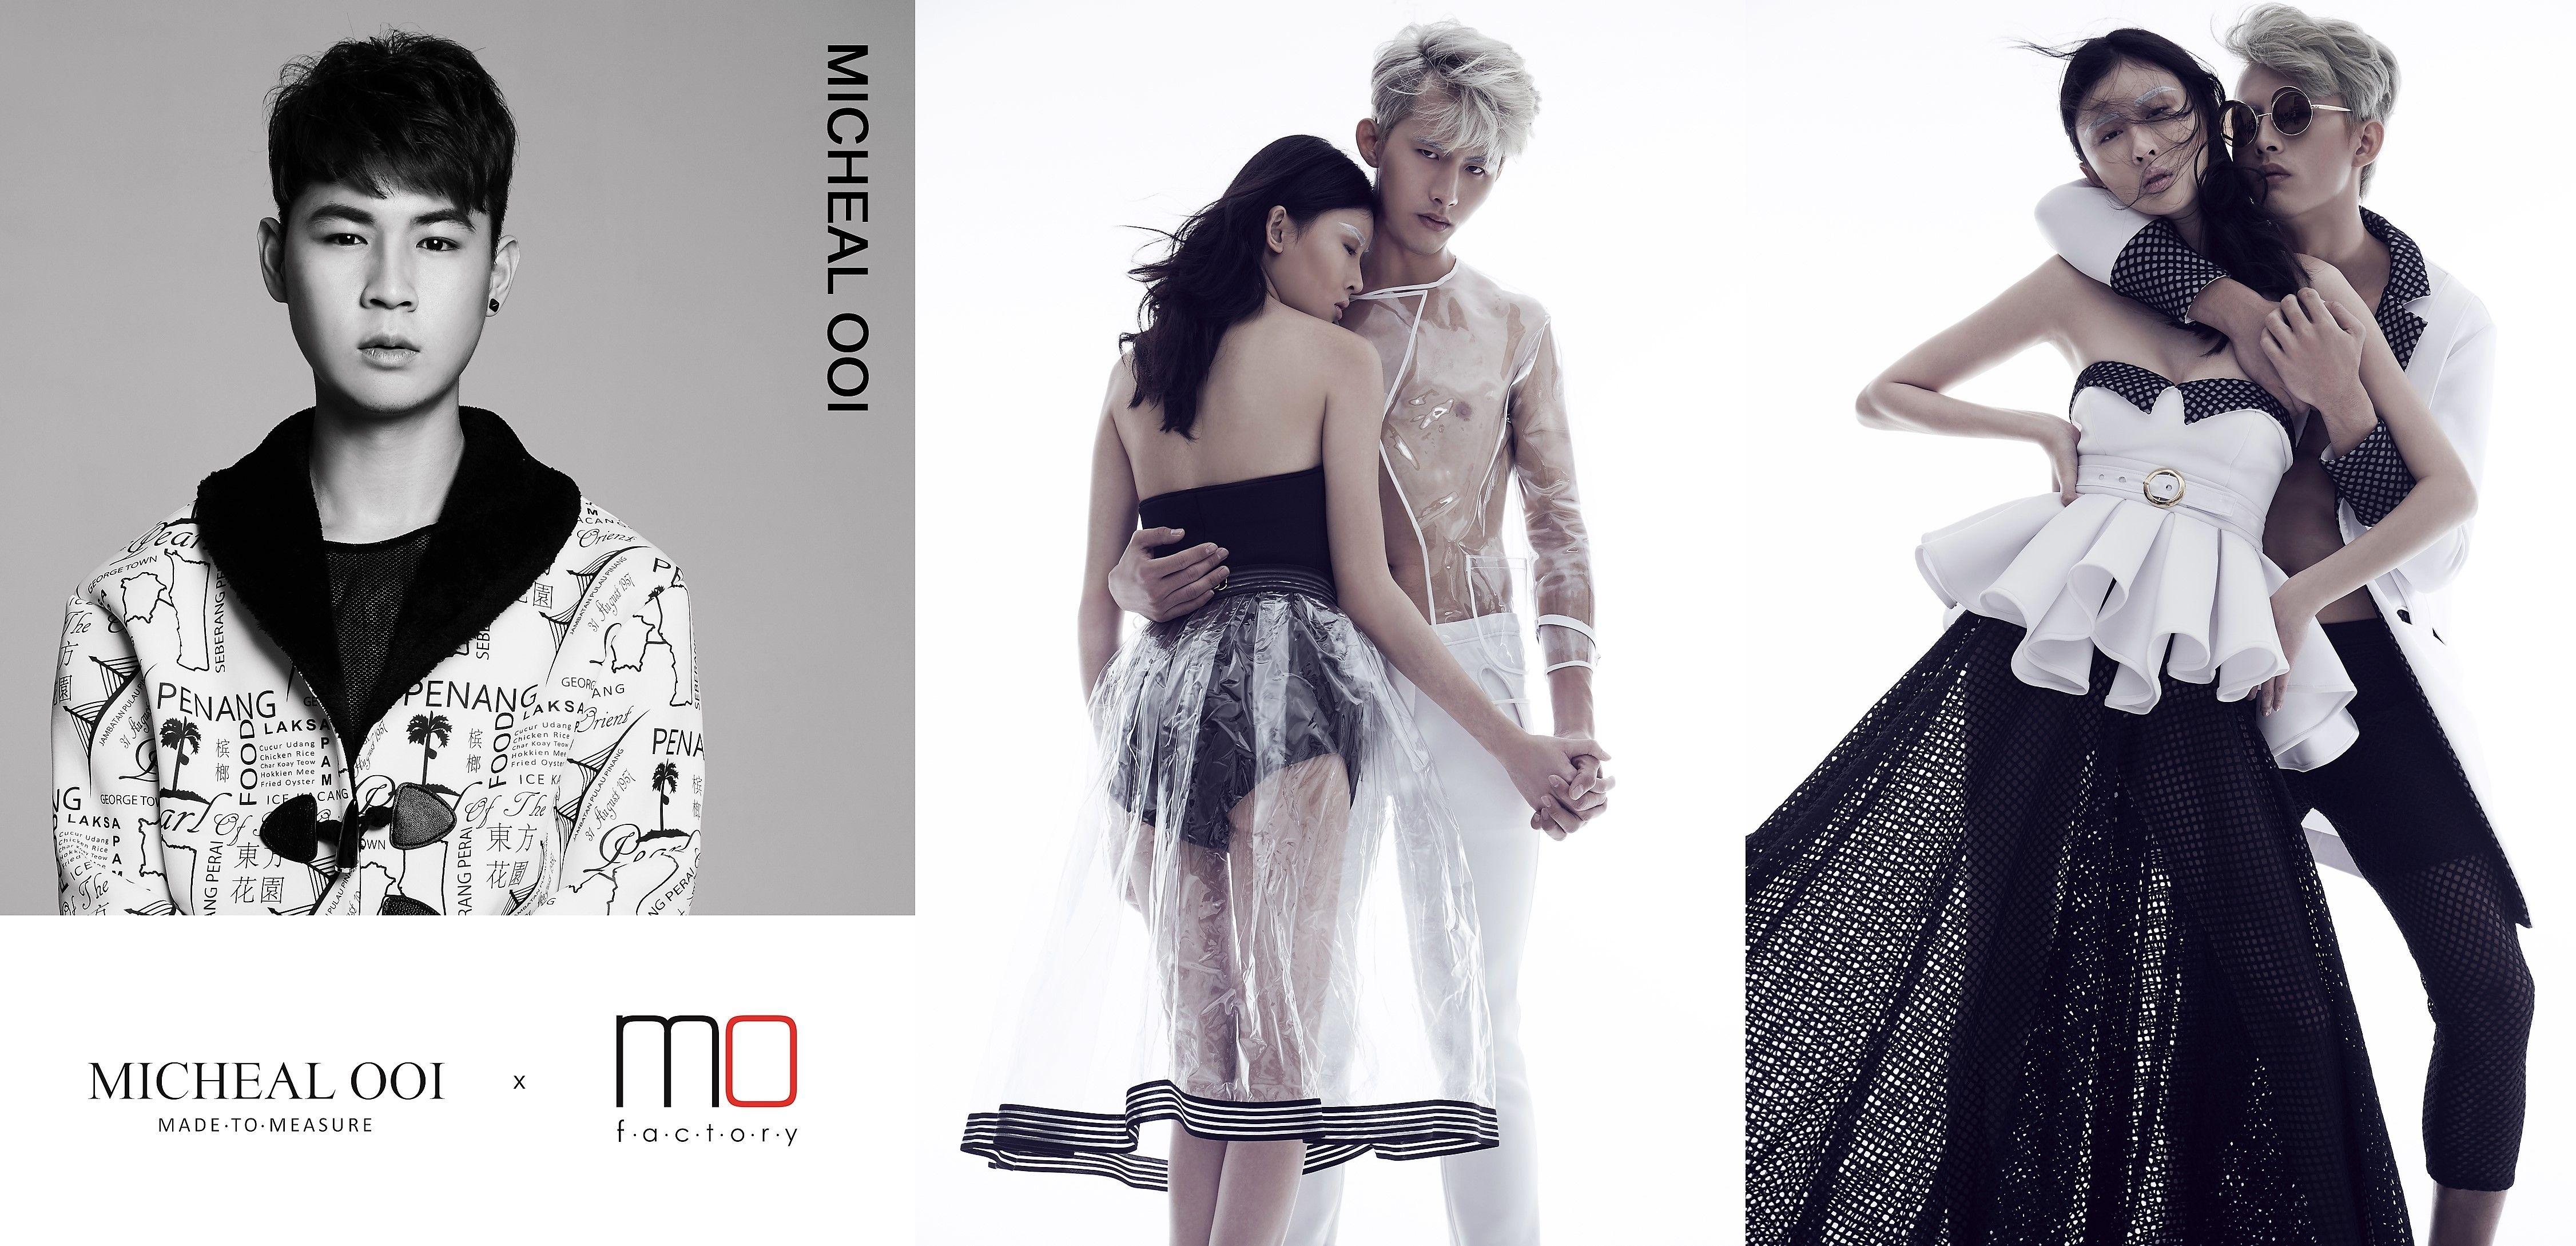 Afds Fashion Ambassador Micheal Ooi Fashion Diploma In Fashion Designing Fashion Design